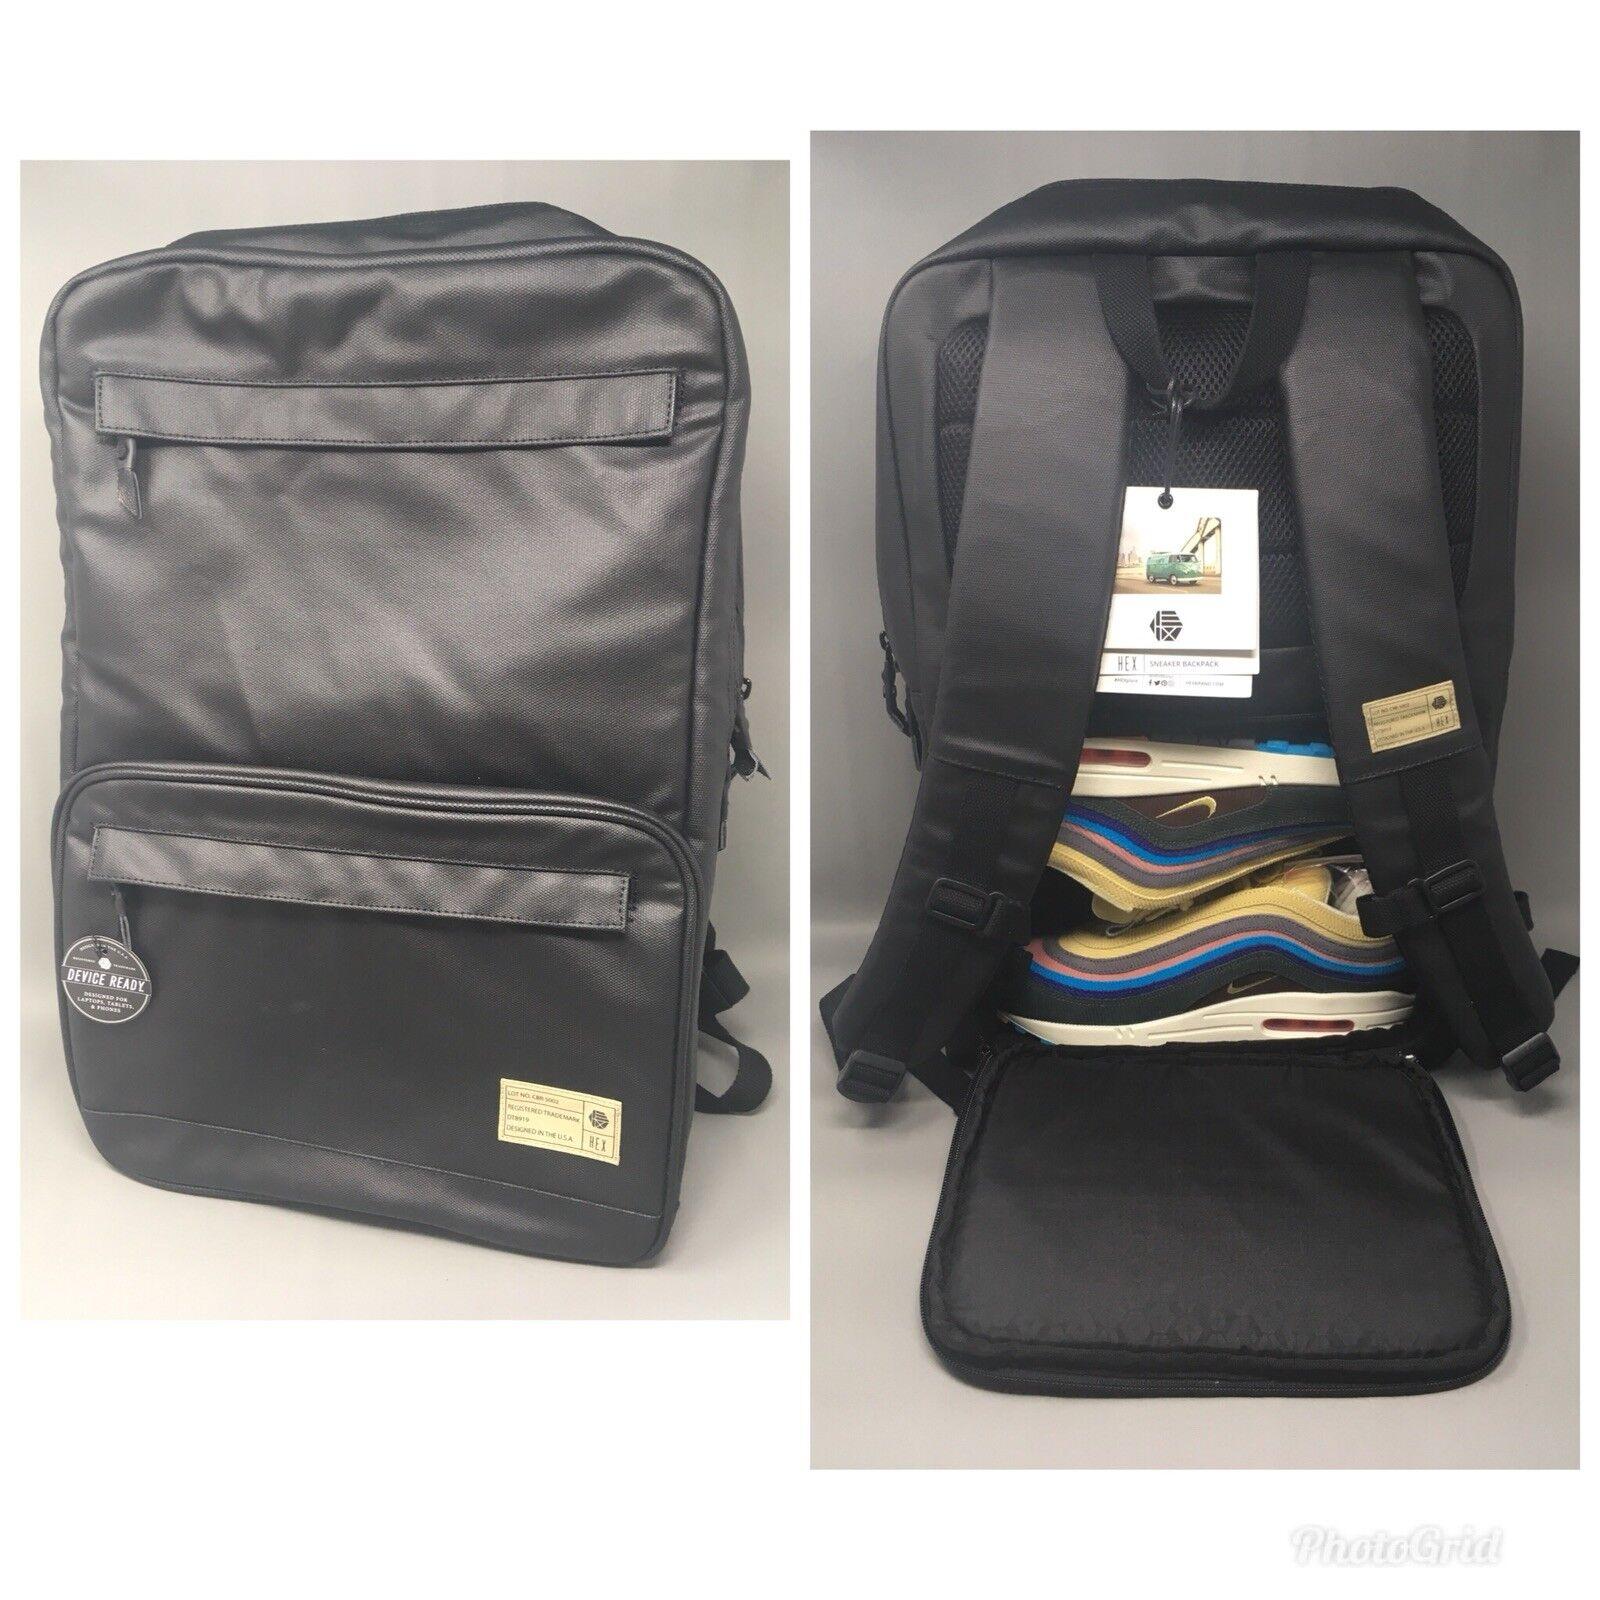 COMME DES FUCKDOWN Backpack Bag Hipster Streetwear School College BLACK NAVY